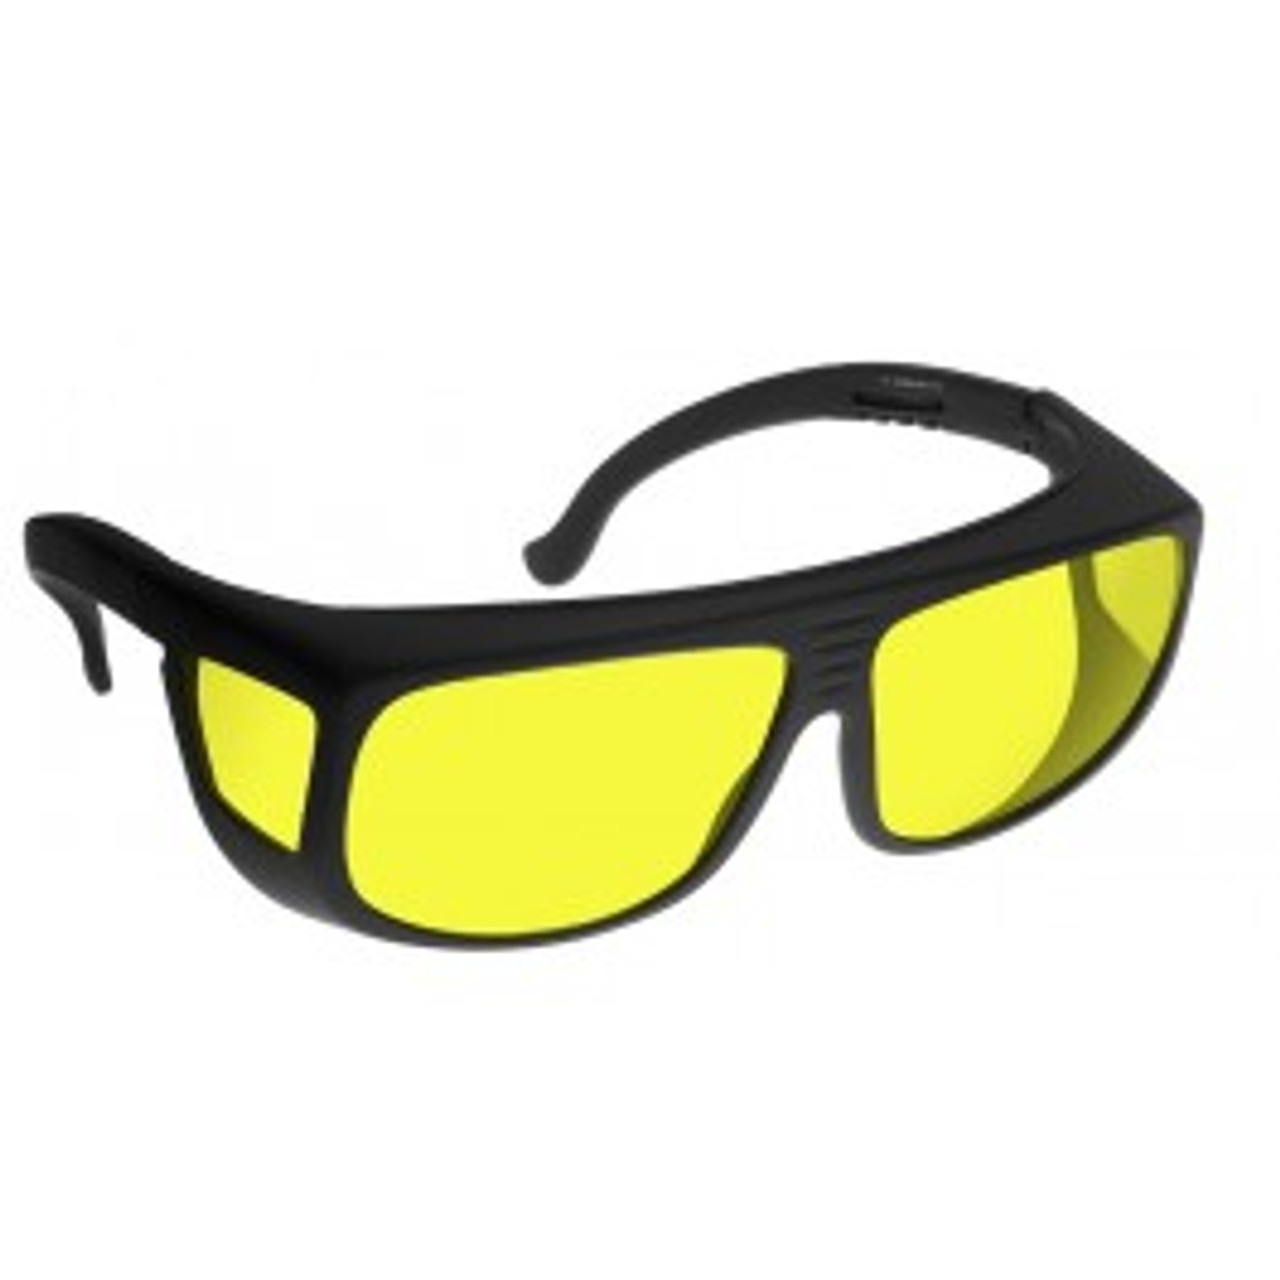 NoIR 87% Yellow SpectraShield (Medium Frame) 450-36